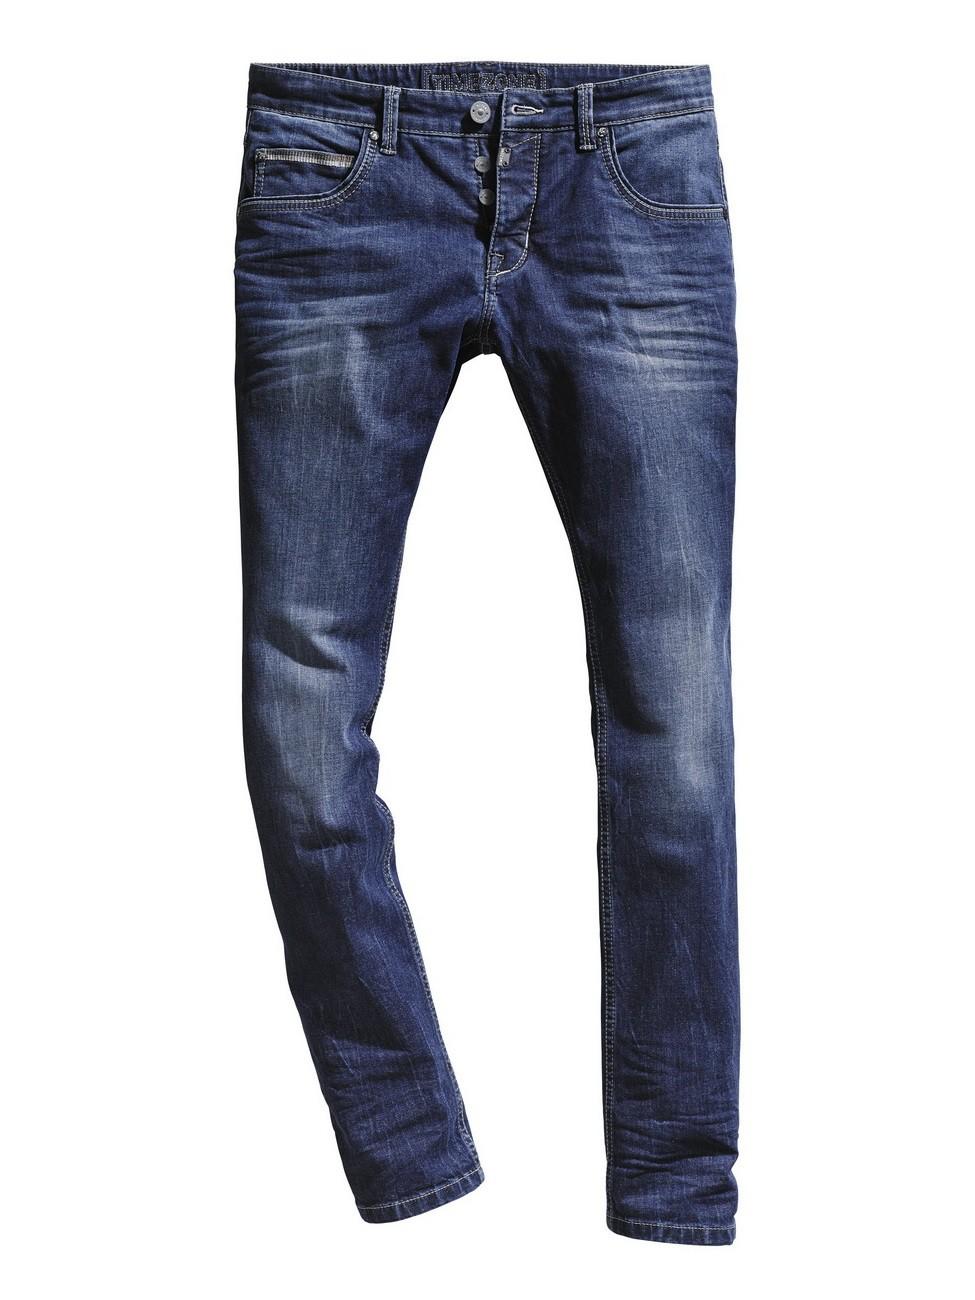 Timezone Herren Jeans EdoTZ - Slim Fit - Surfer Wash